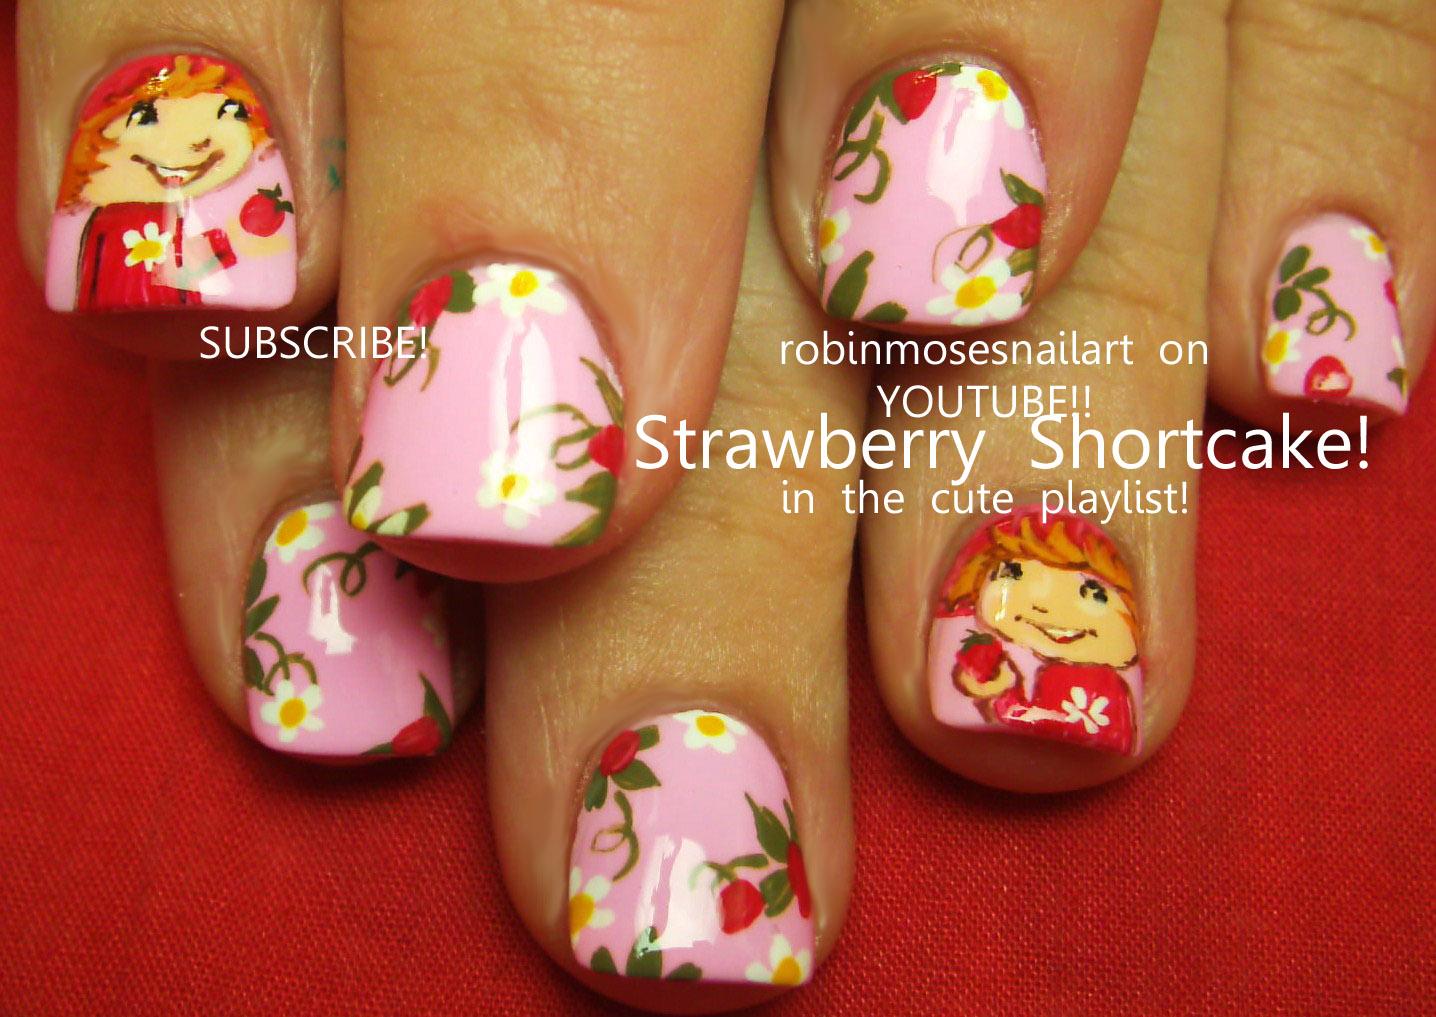 Strawberry Shortcake Nail Art 2